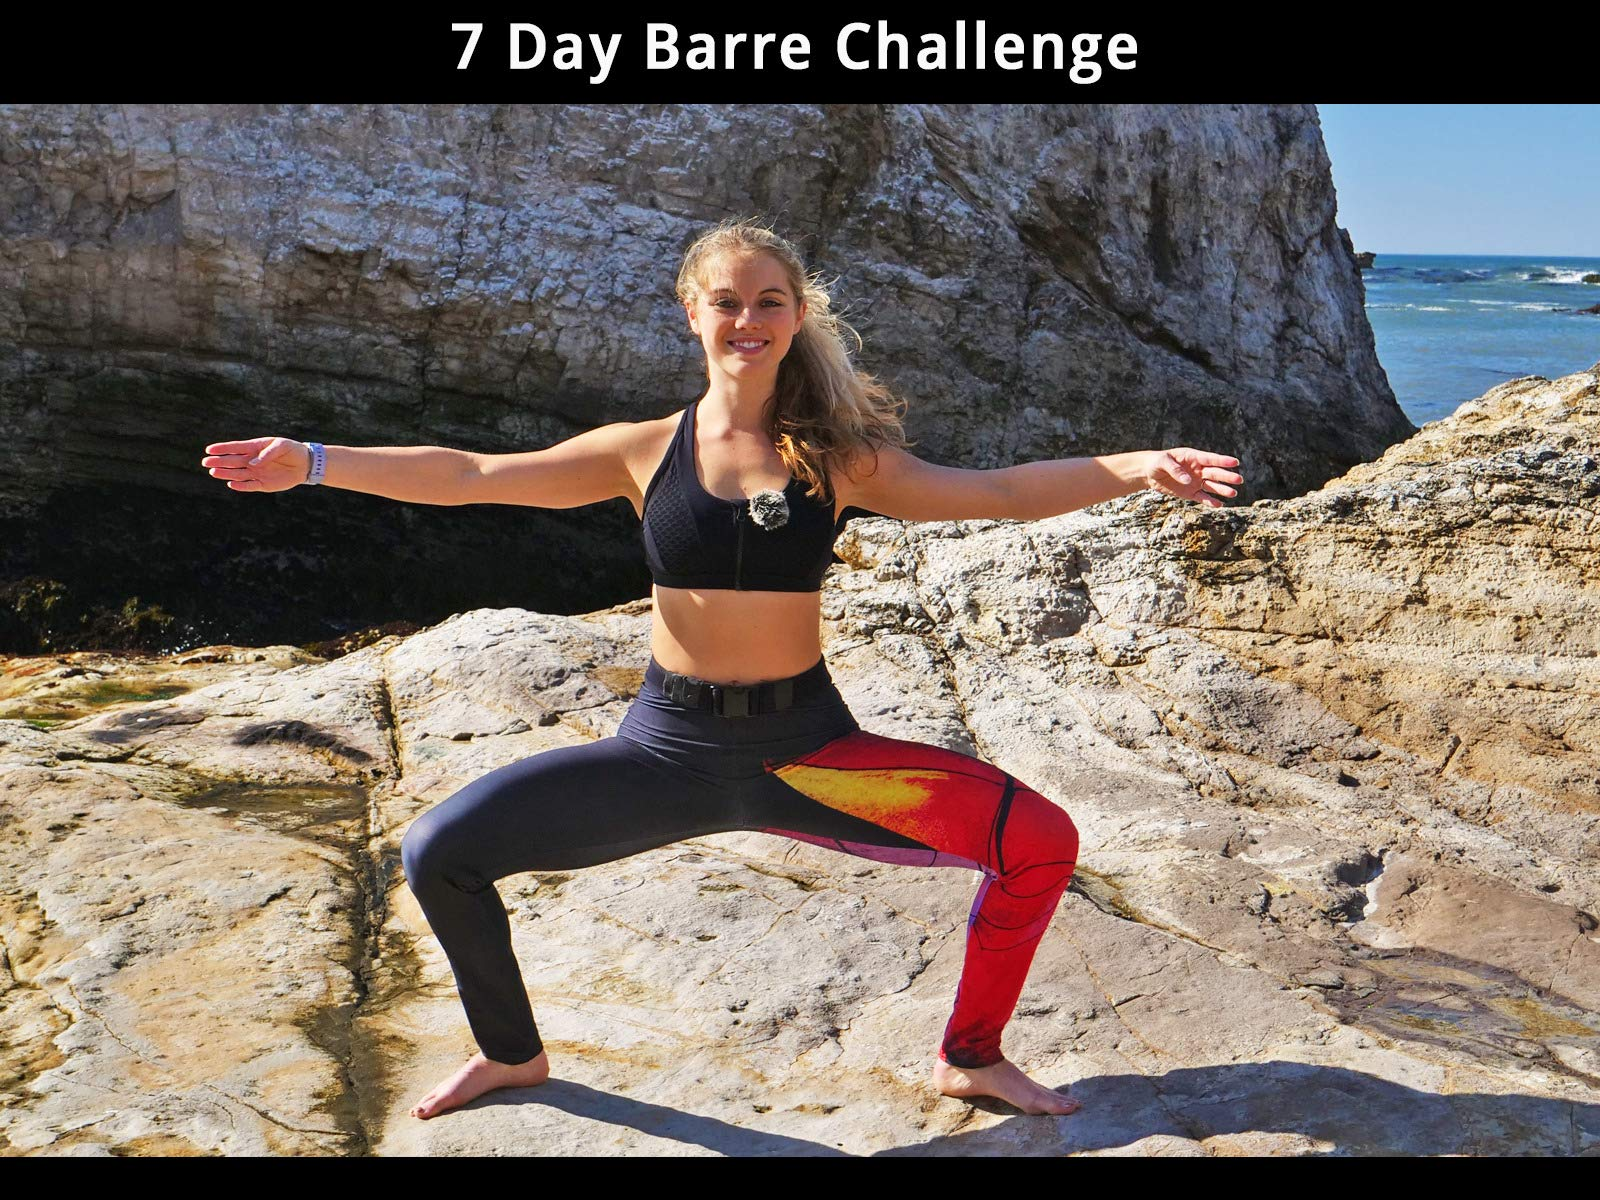 7 Day Barre Challenge on Amazon Prime Video UK